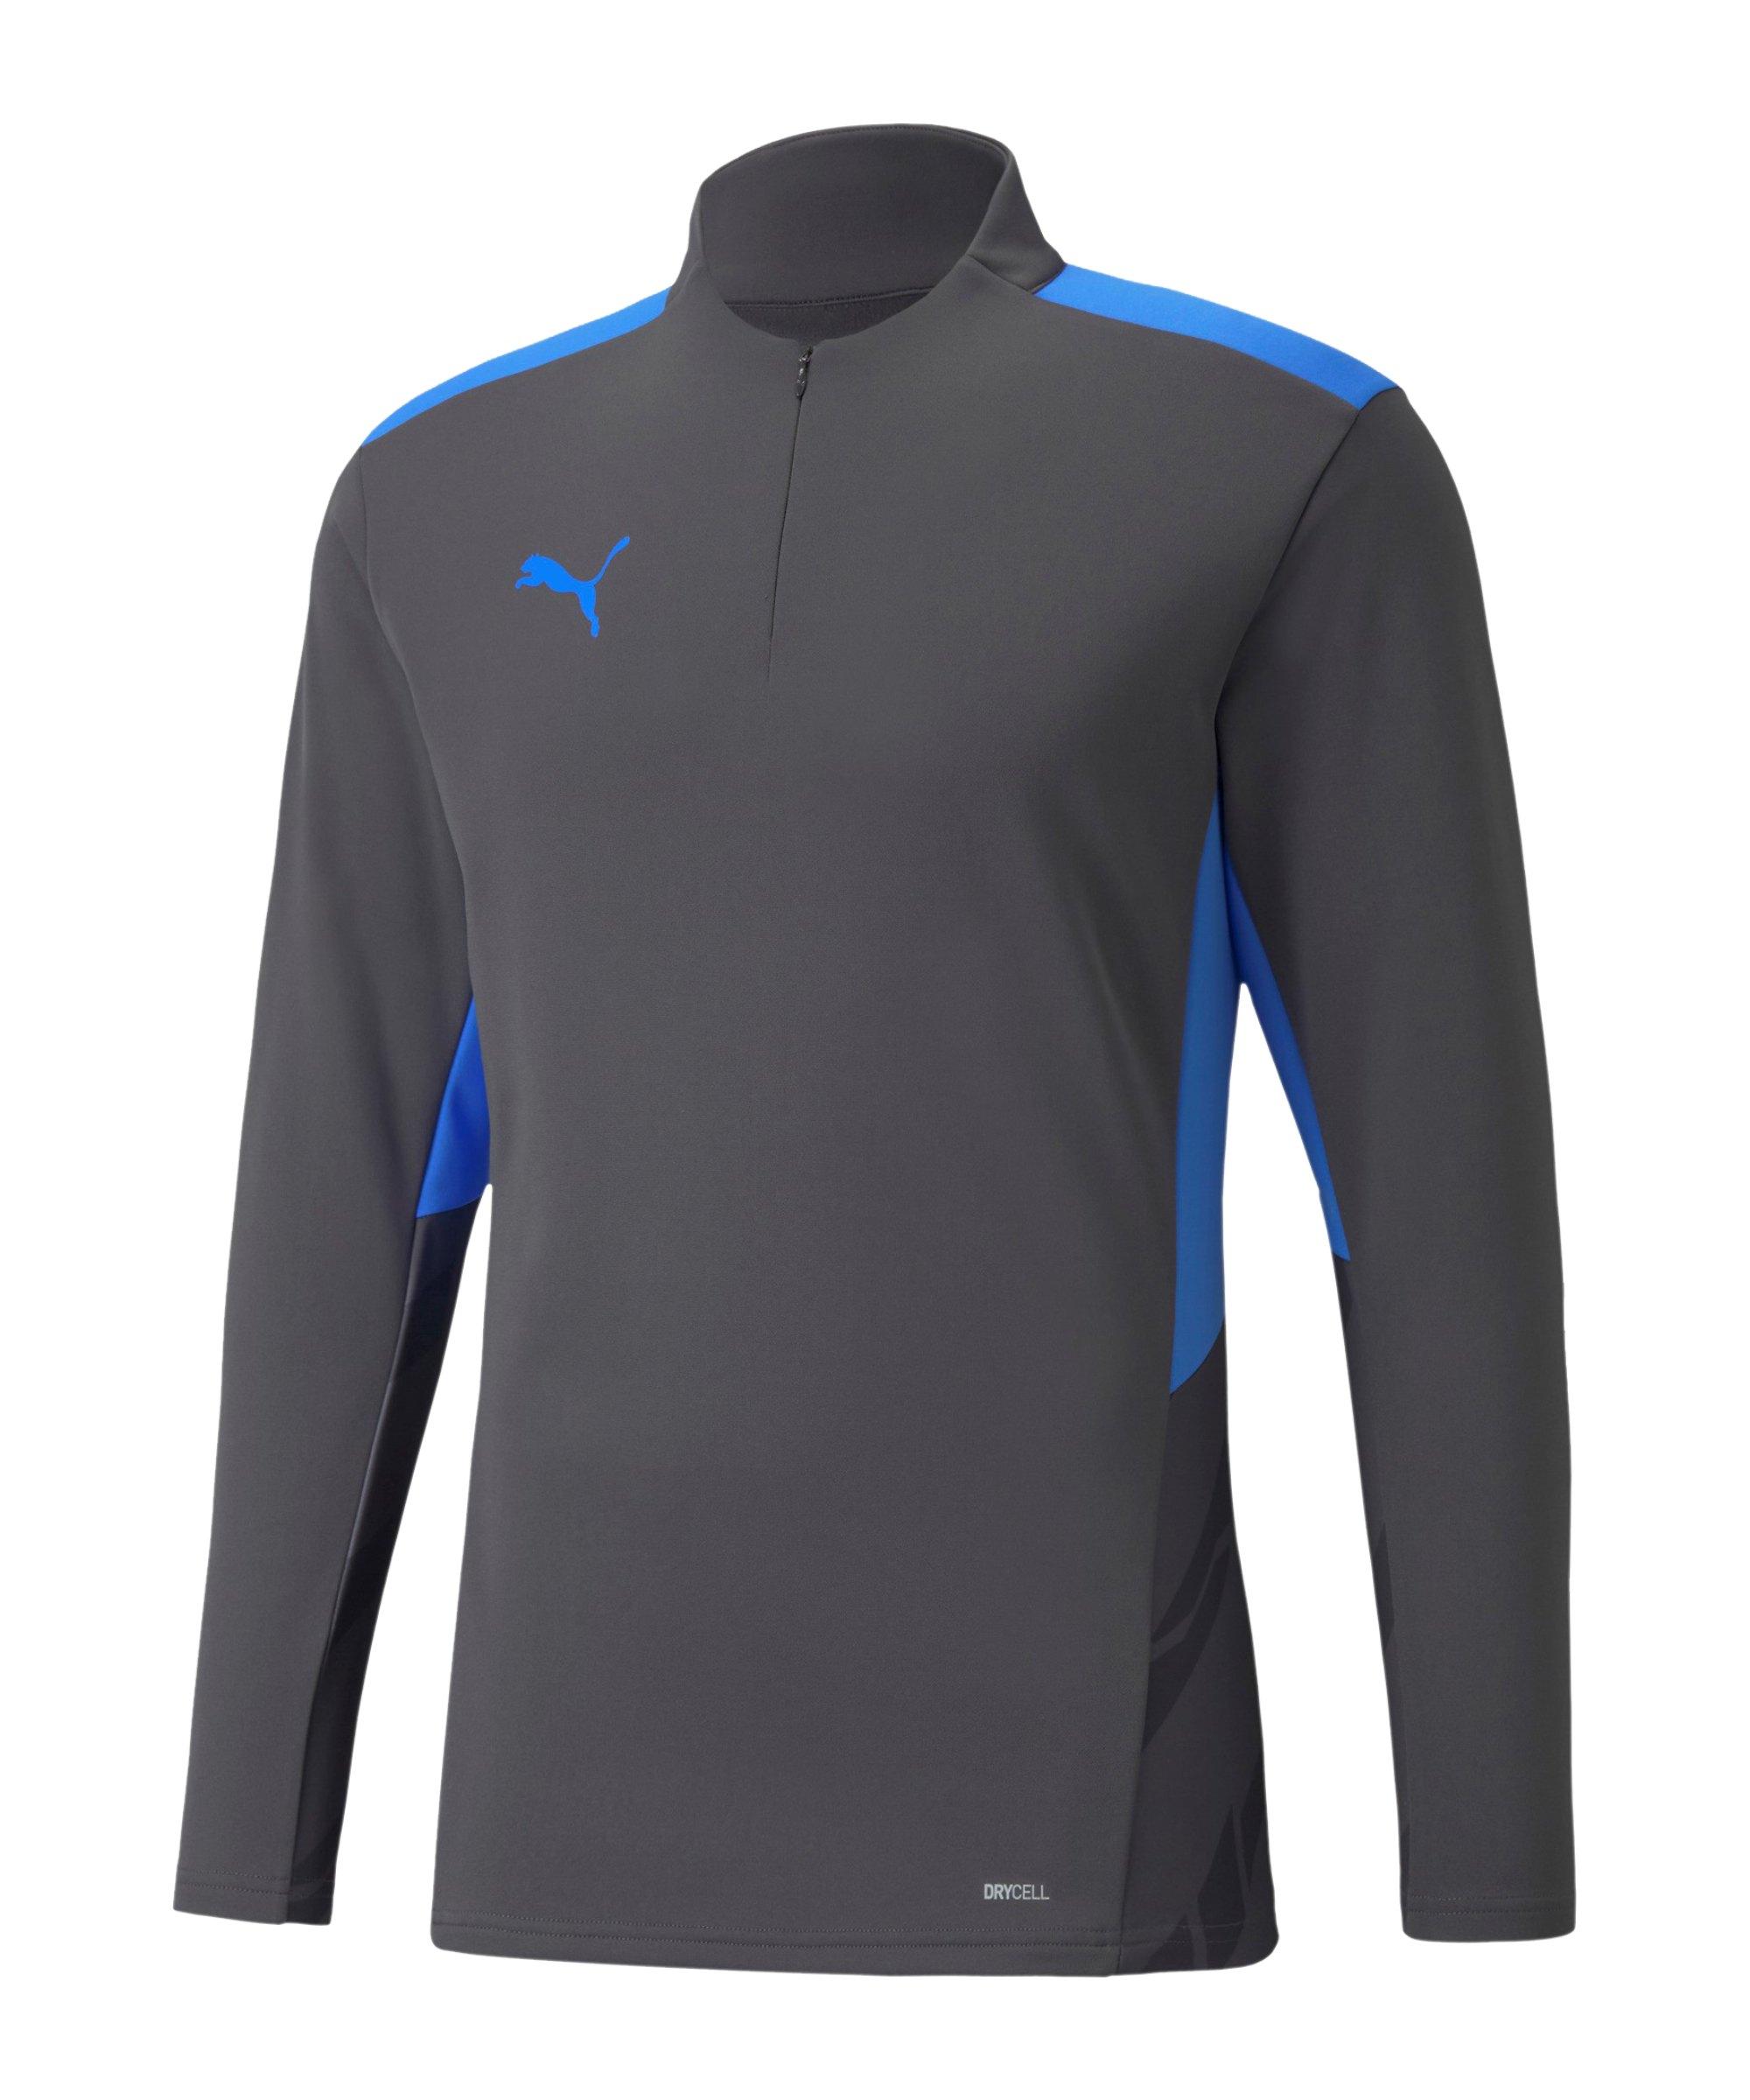 PUMA individualCUP HalfZip Sweatshirt Grau F44 - grau